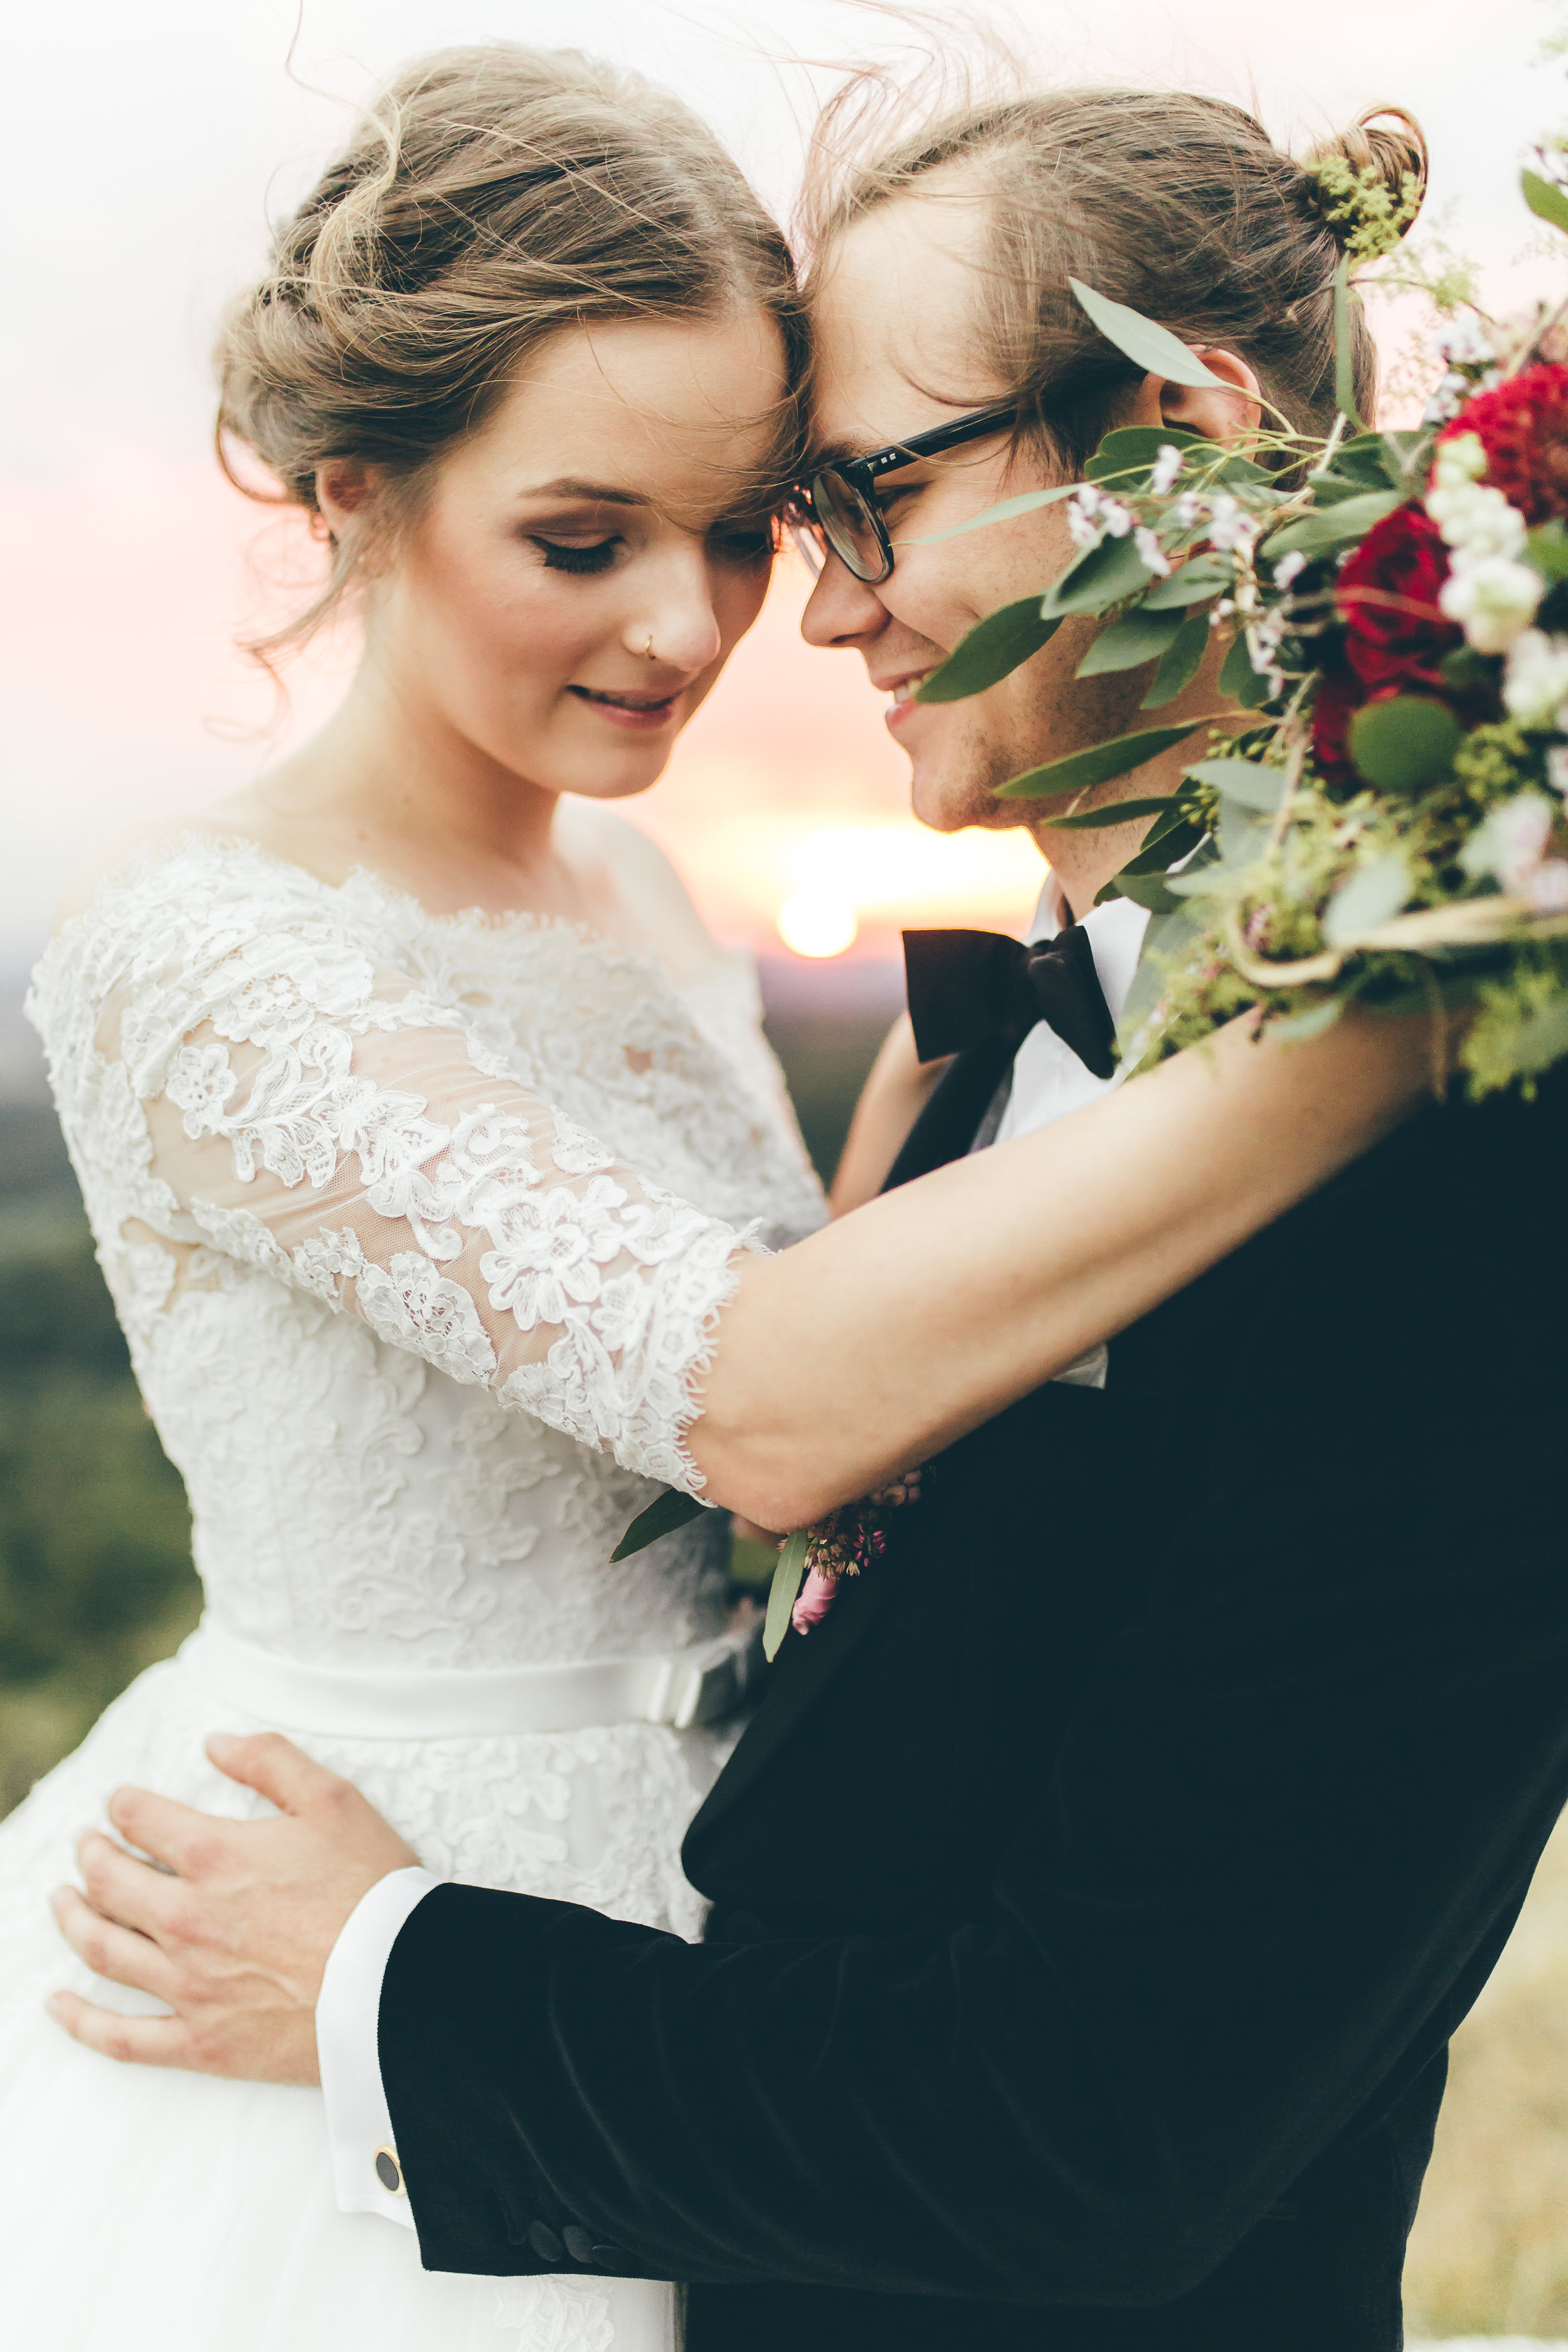 Lea-Lillian-Fotografie-After-Wedding-Shooting-.JPG